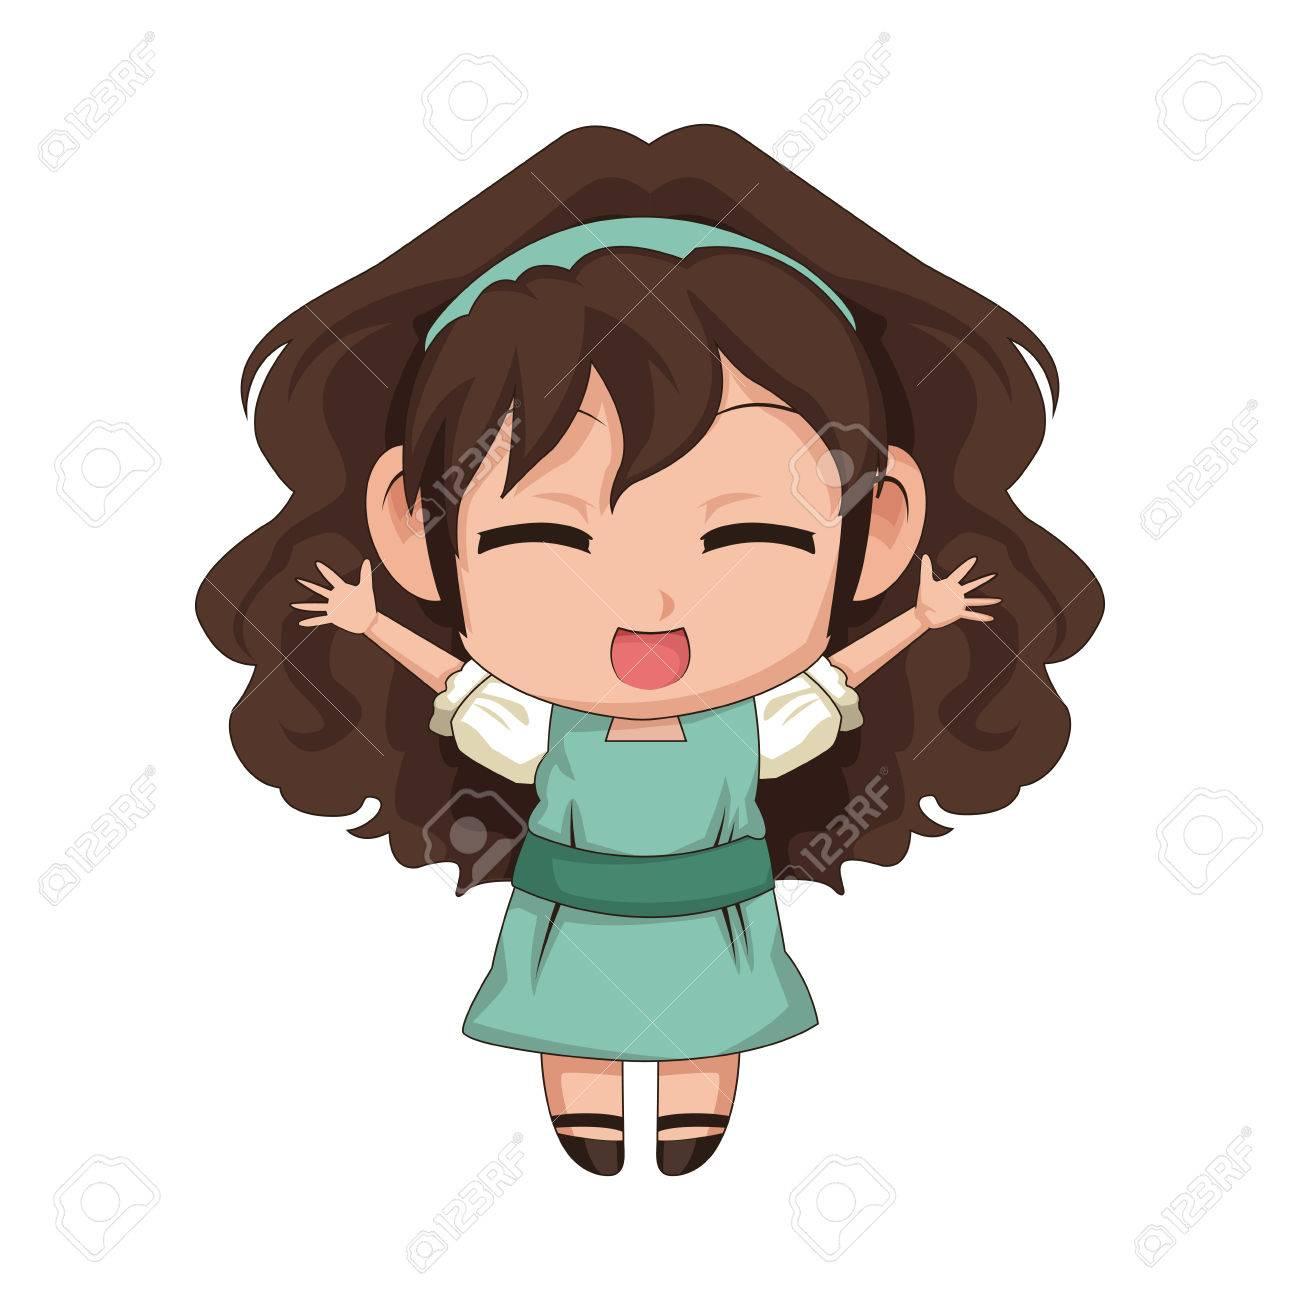 Cute Anime Chibi Little Girl Cartoon Style Vector Illustration Stock